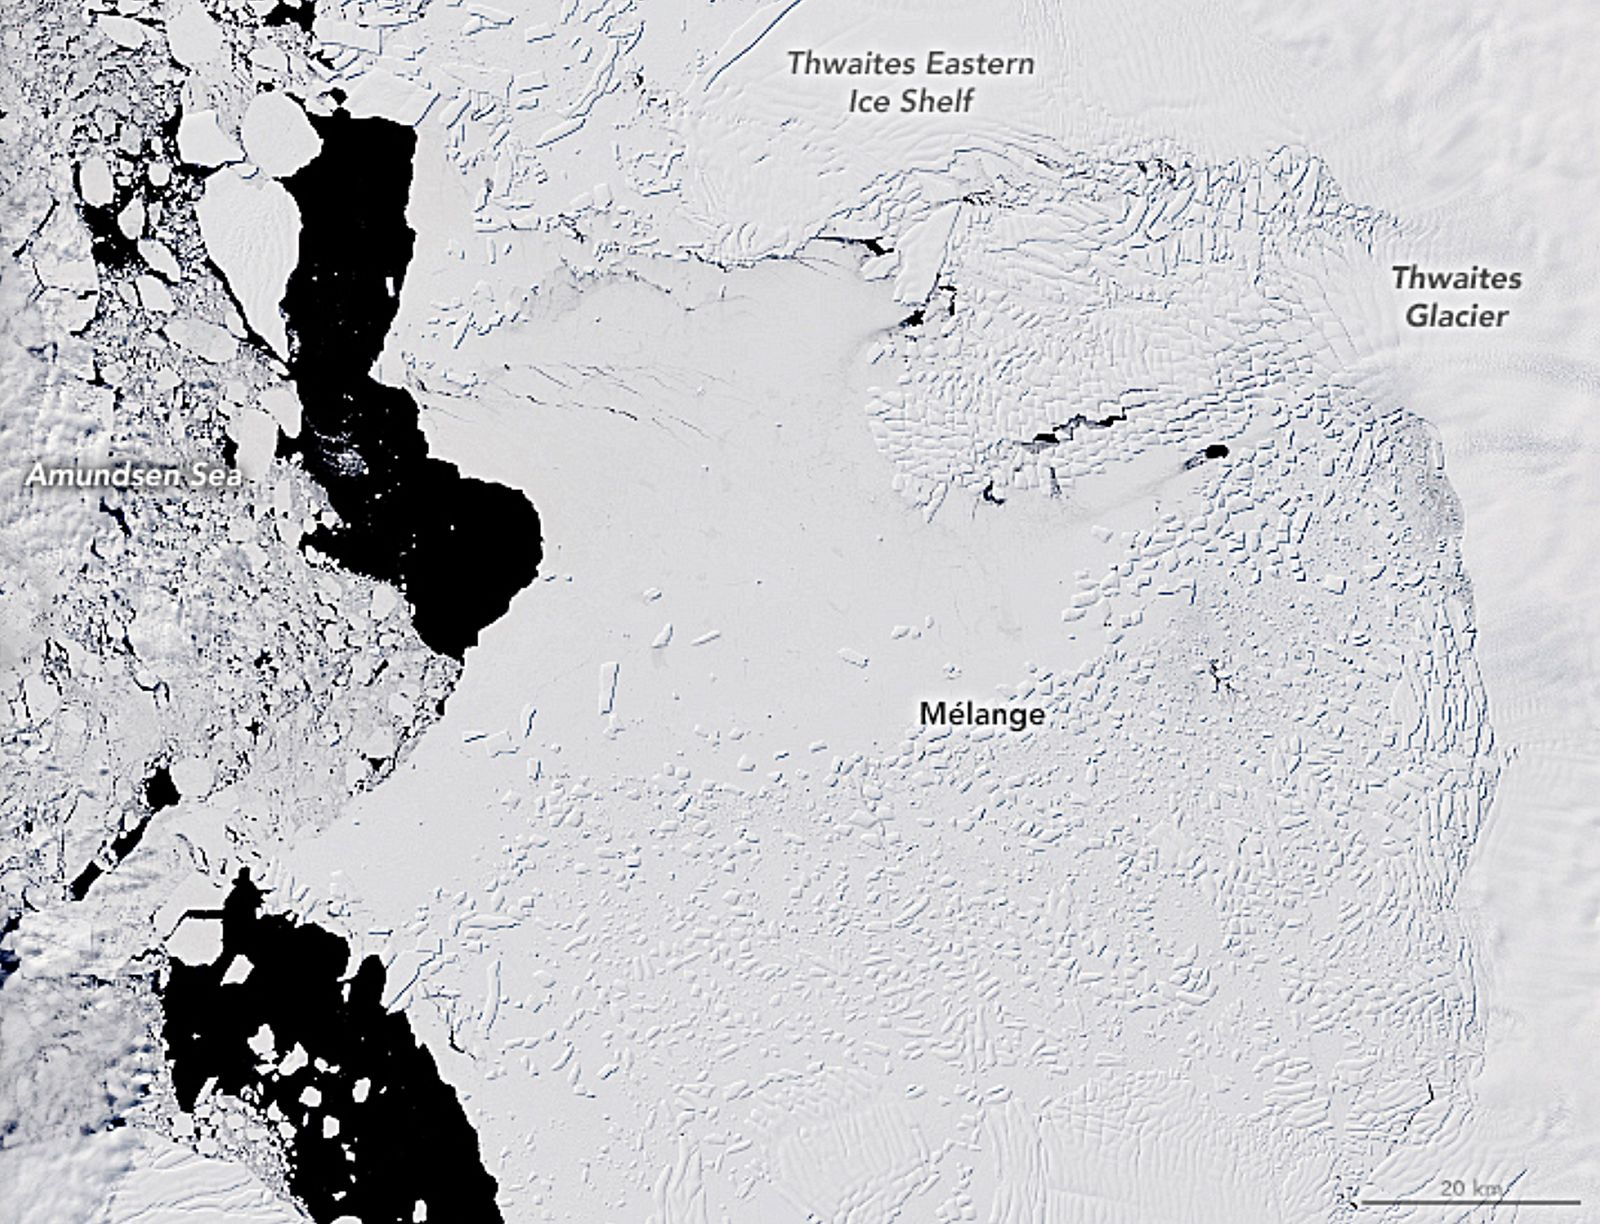 Thwaites glacier transformed